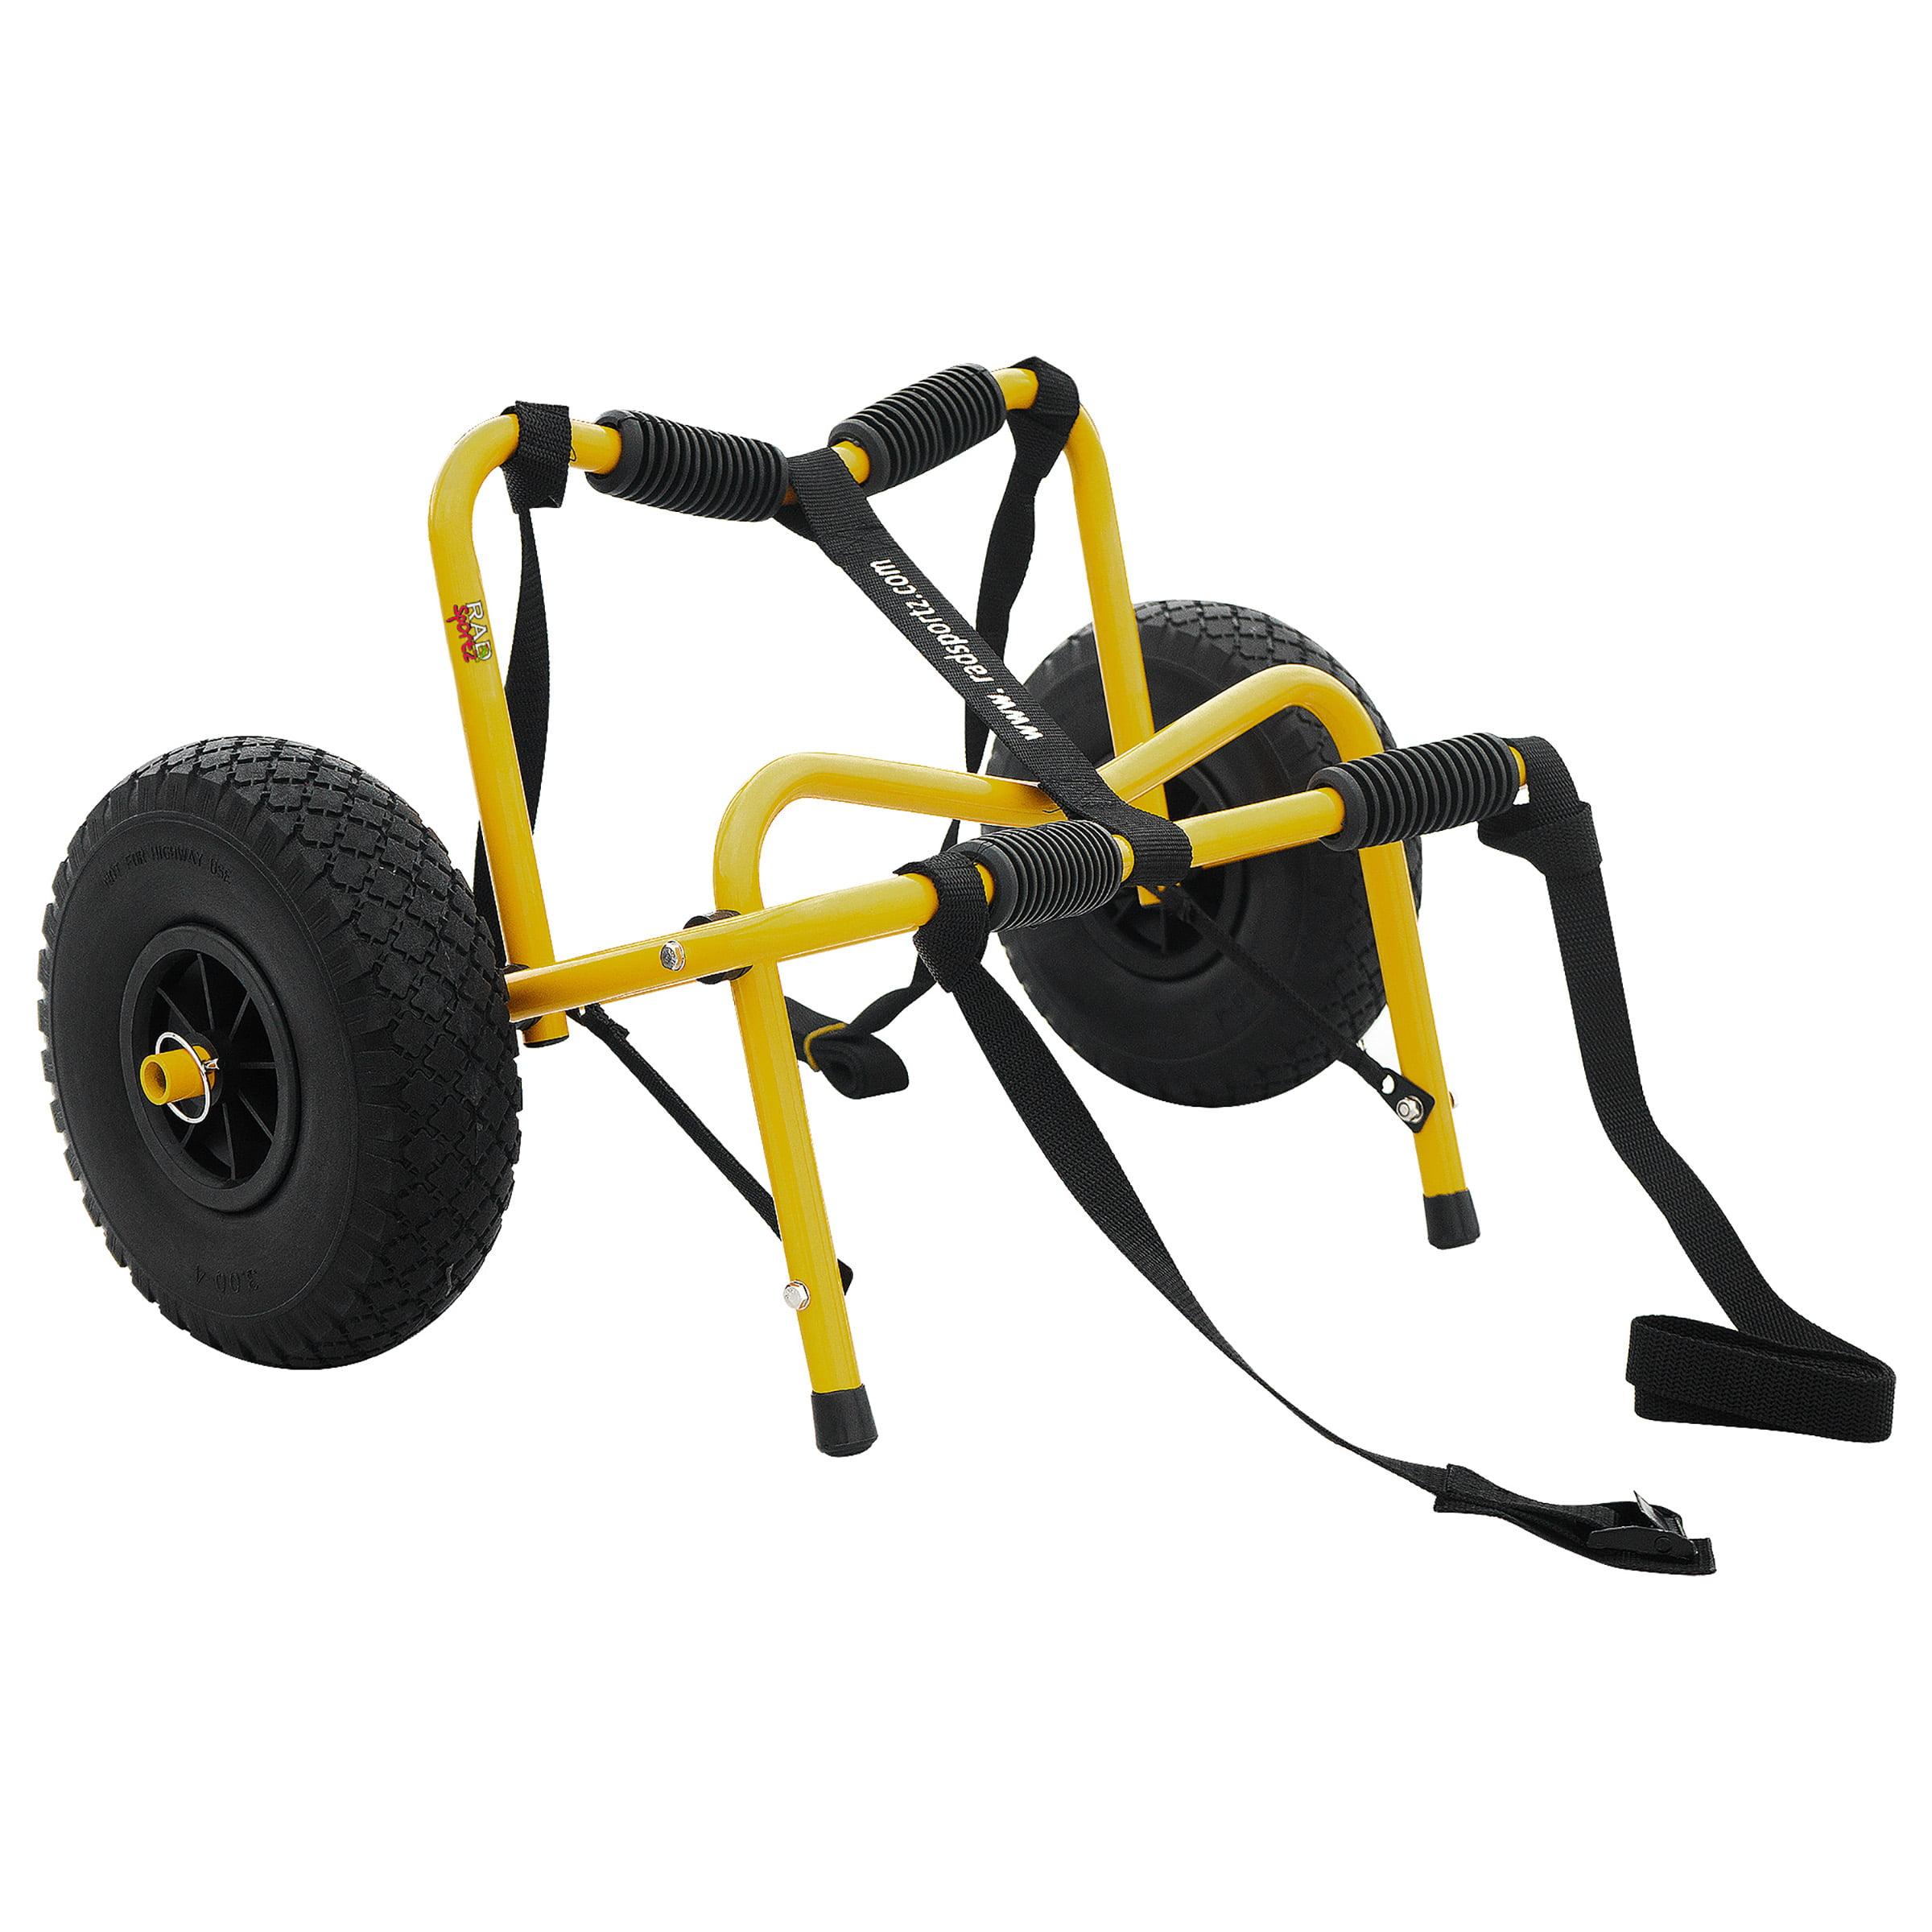 1235 RAD Sportz Kayak Trolley Pro Premium Kayak Cart Airless Tires 150 LB Cap Yellow